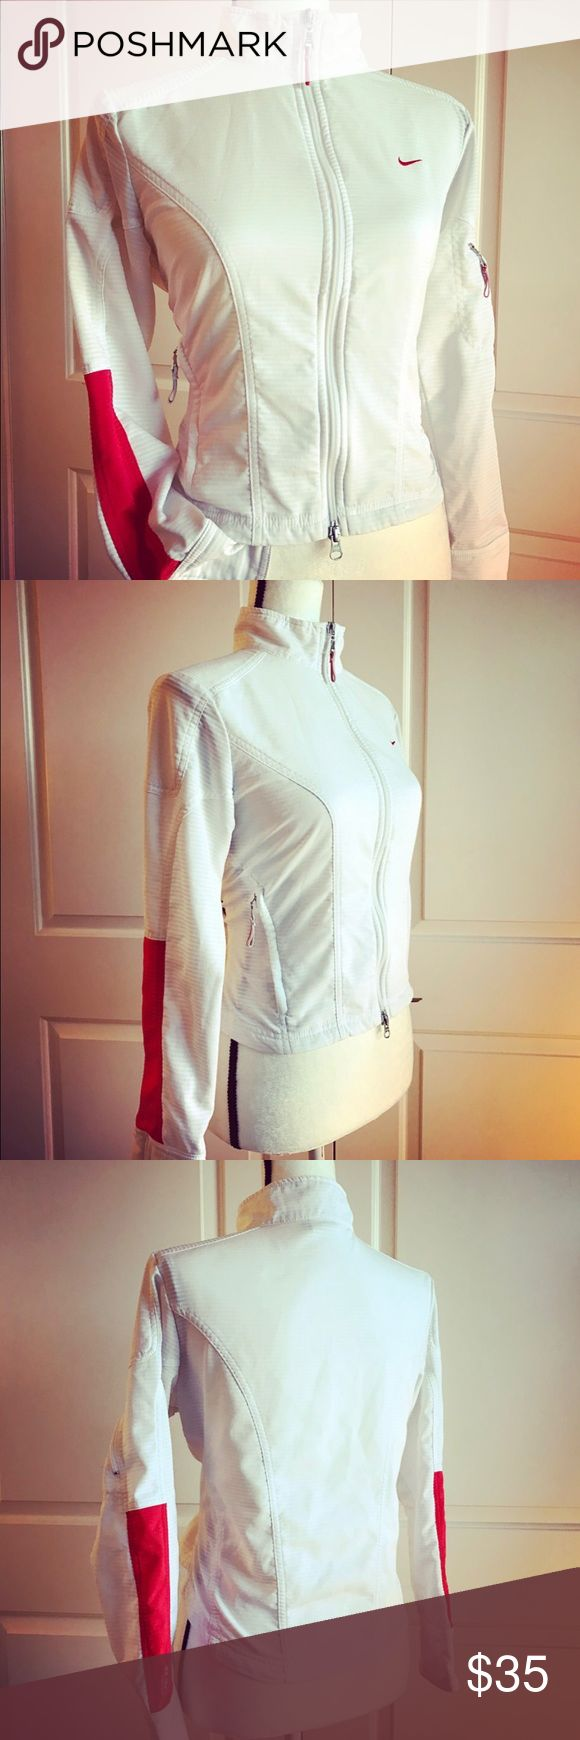 White Nike sport jacket size Small Nike sport jacket. Size Small. Cute on. Nike Jackets & Coats